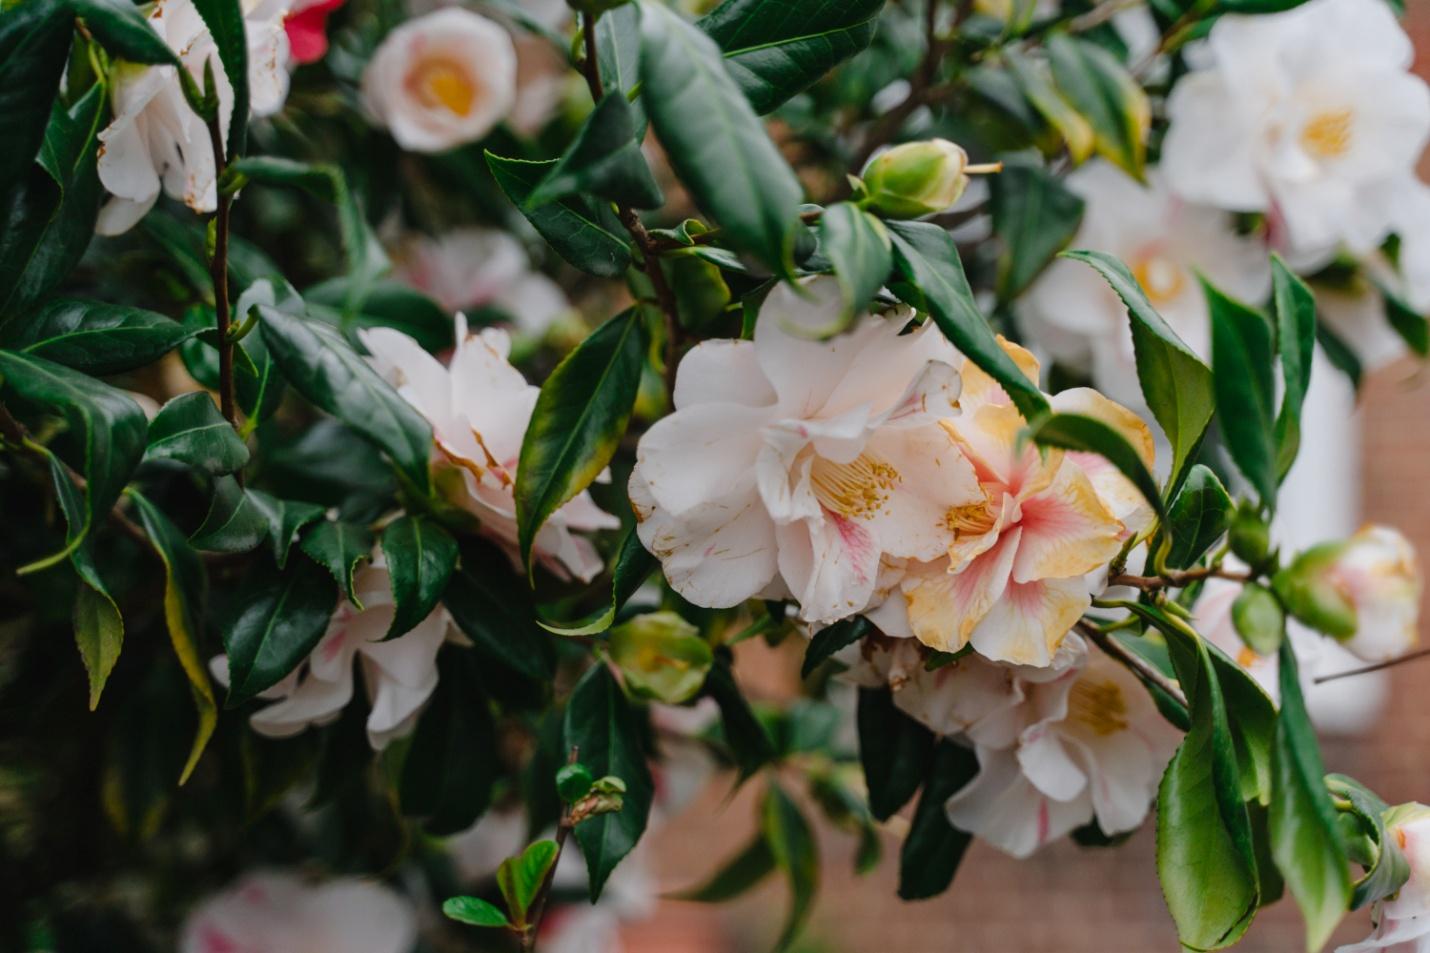 Choosing trailing flowers